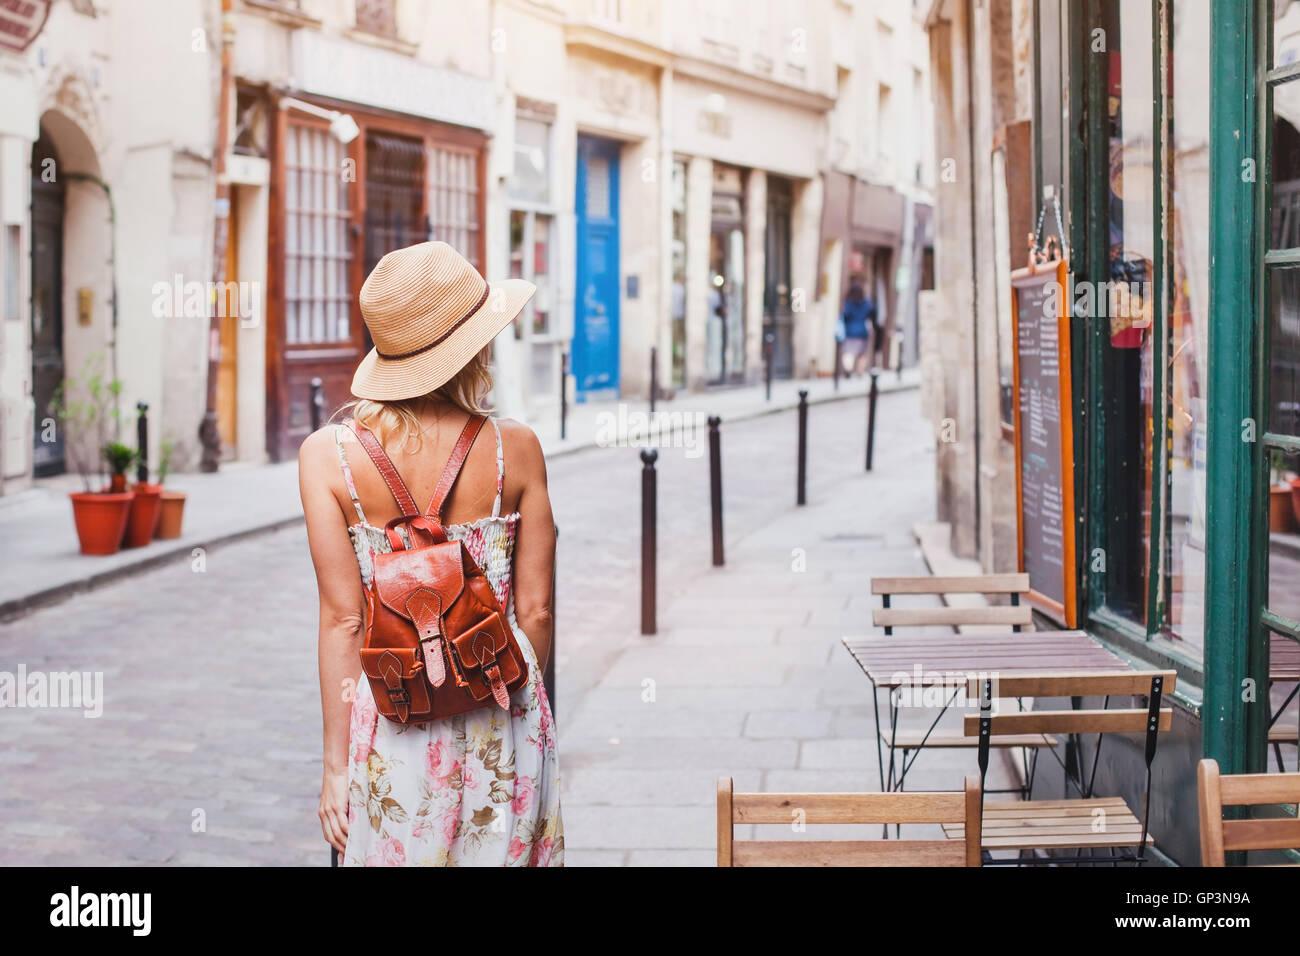 Frau Tourist auf der Straße, Sommer Mode-Stil, Reisen nach Europa Stockbild